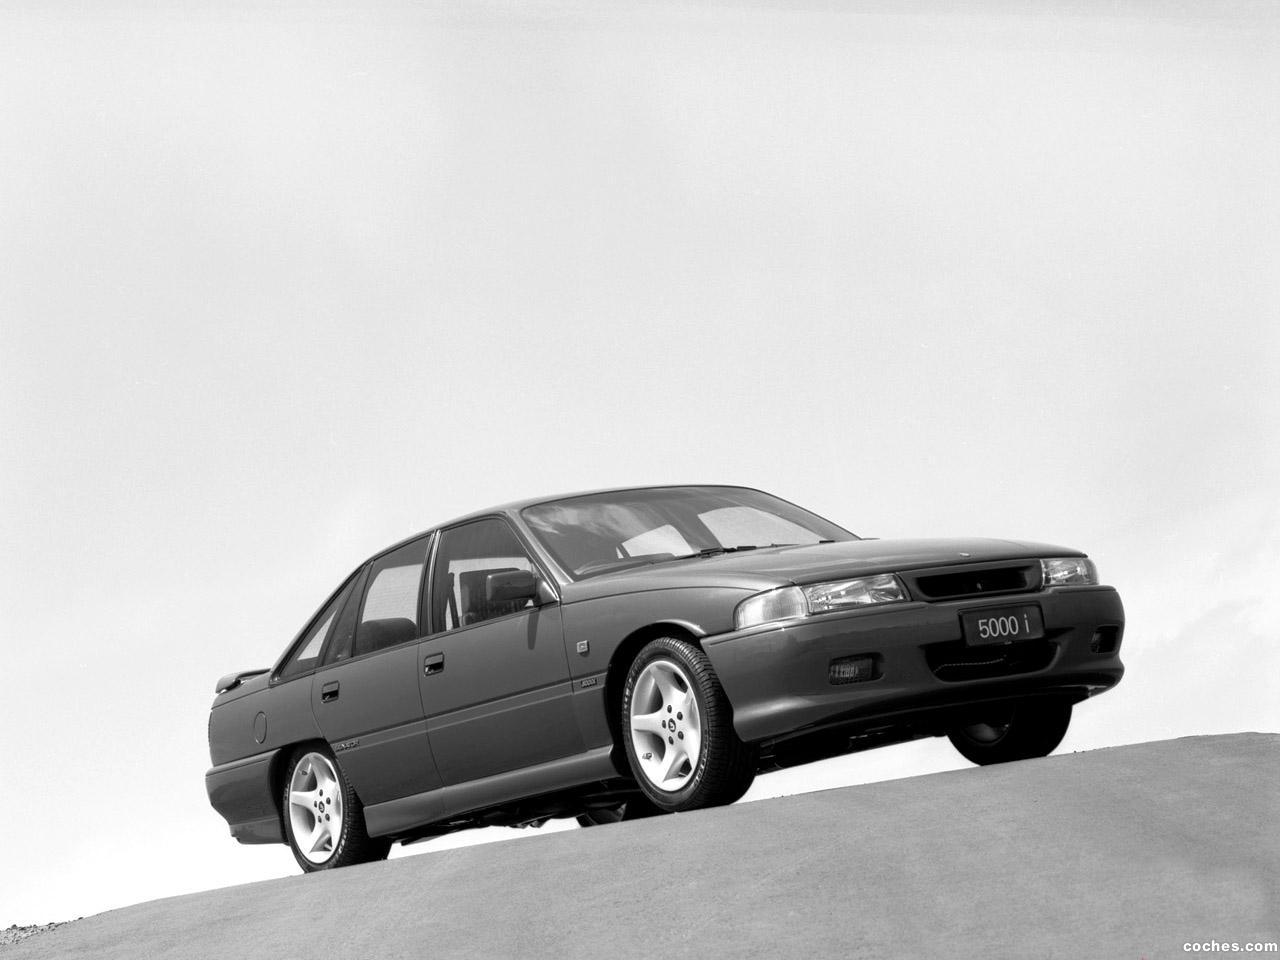 Foto 0 de Holden HSV Senator VP 5000i 1992